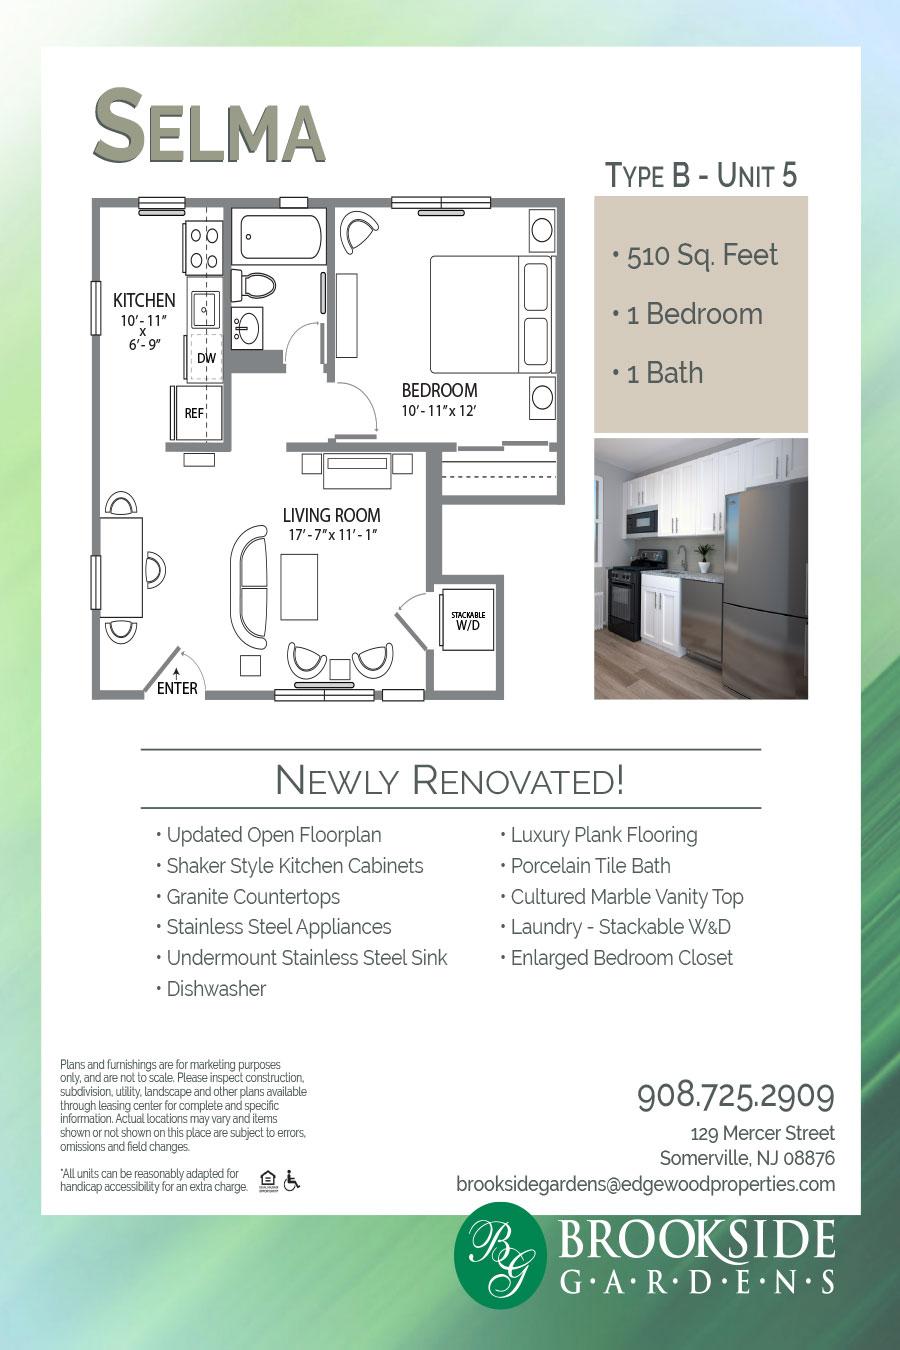 Brookside Gardens Apartment Floor Plan Selma Type B - Unit 5